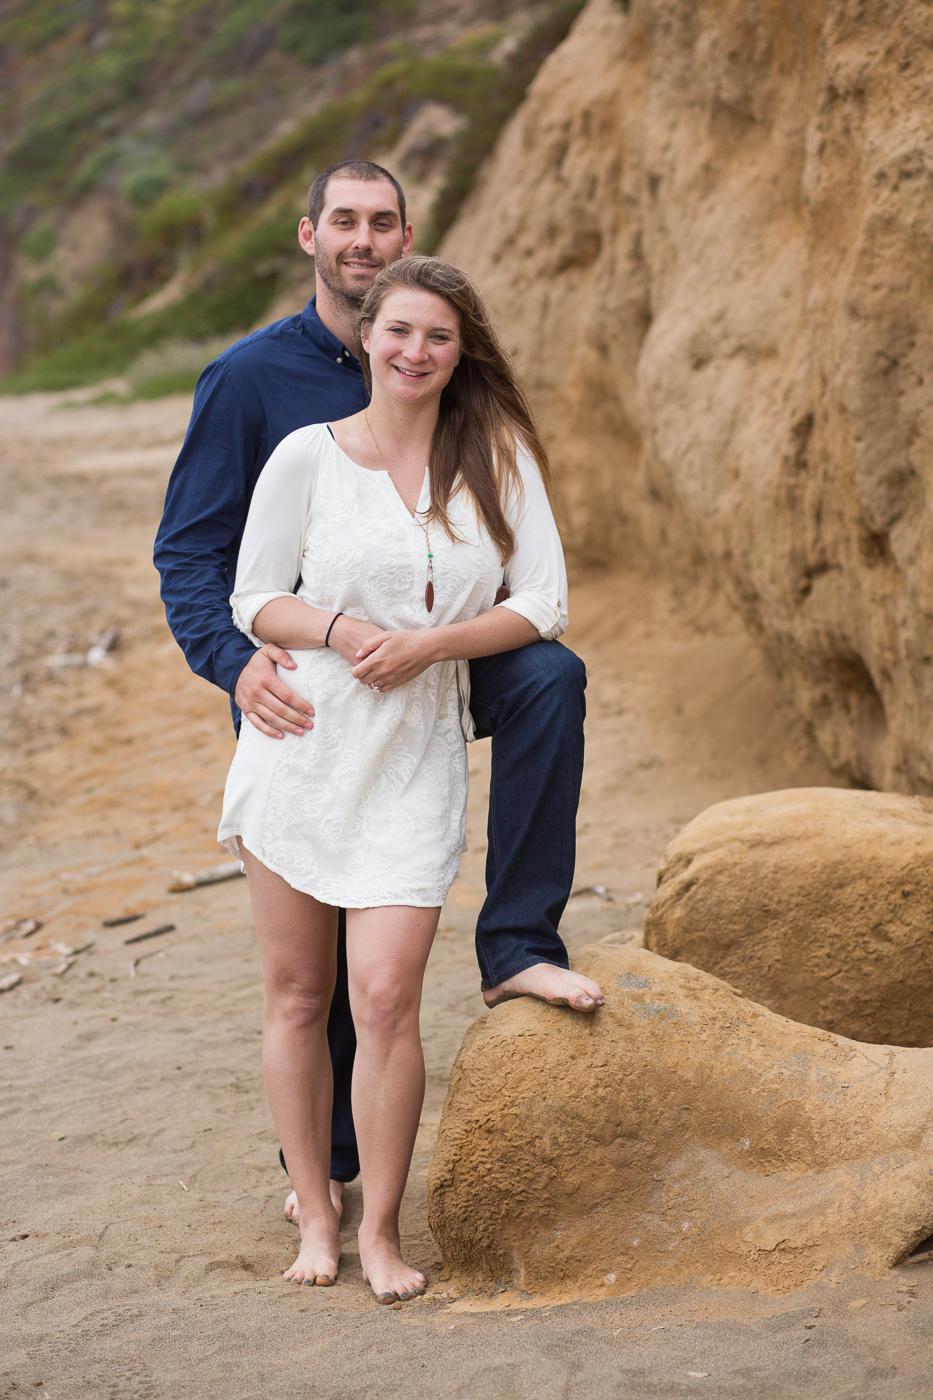 Baker-beach-san-francisco-california-engagement-session-16.jpg